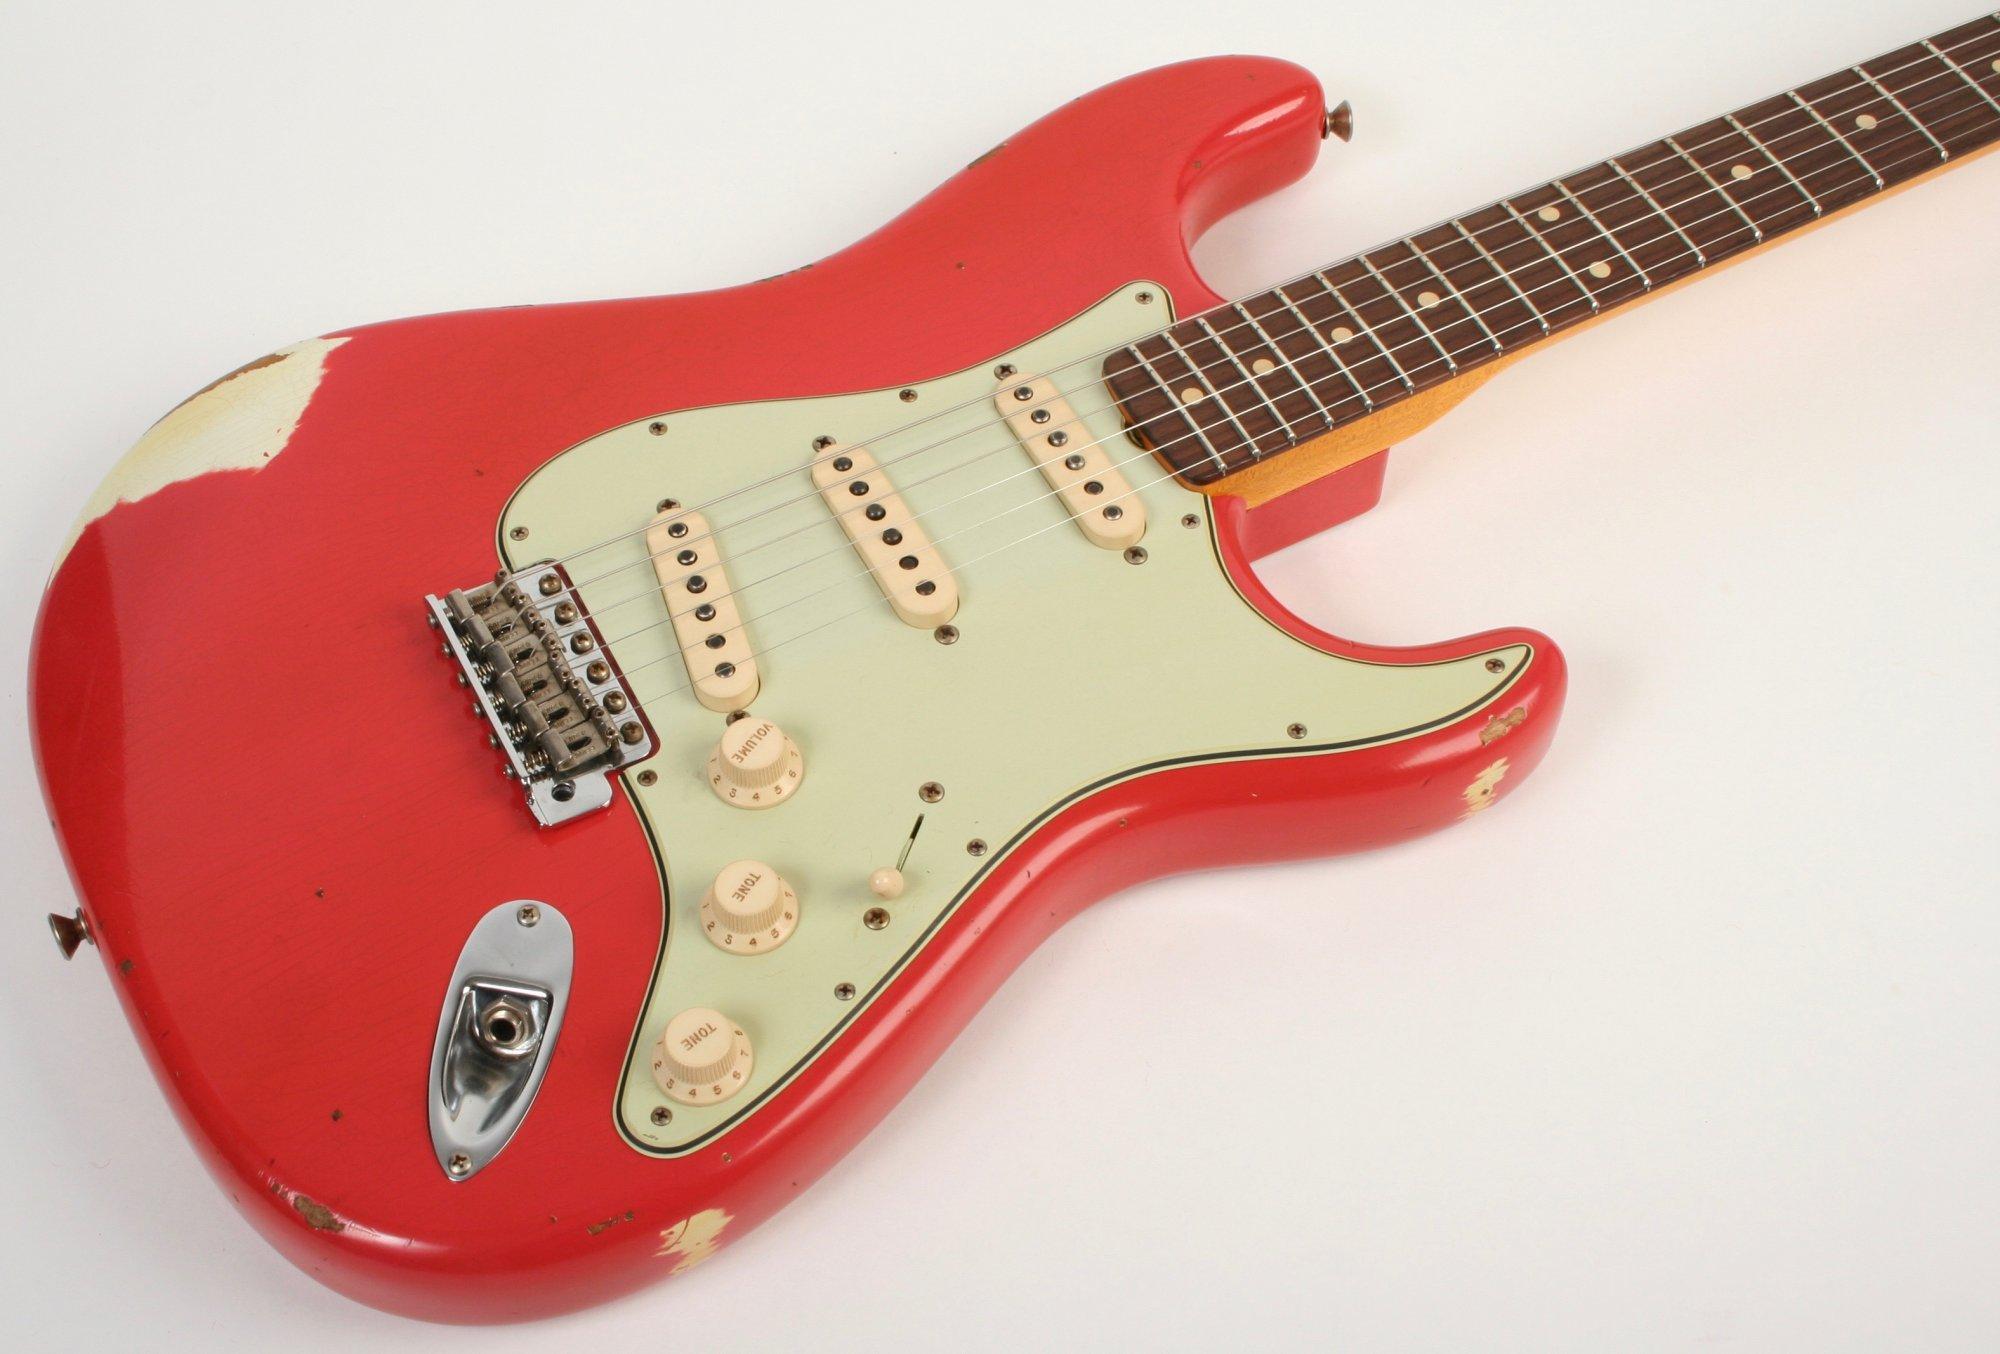 Fender Custom Shop 1963 Stratocaster Relic Fiesta Red over Olympic White